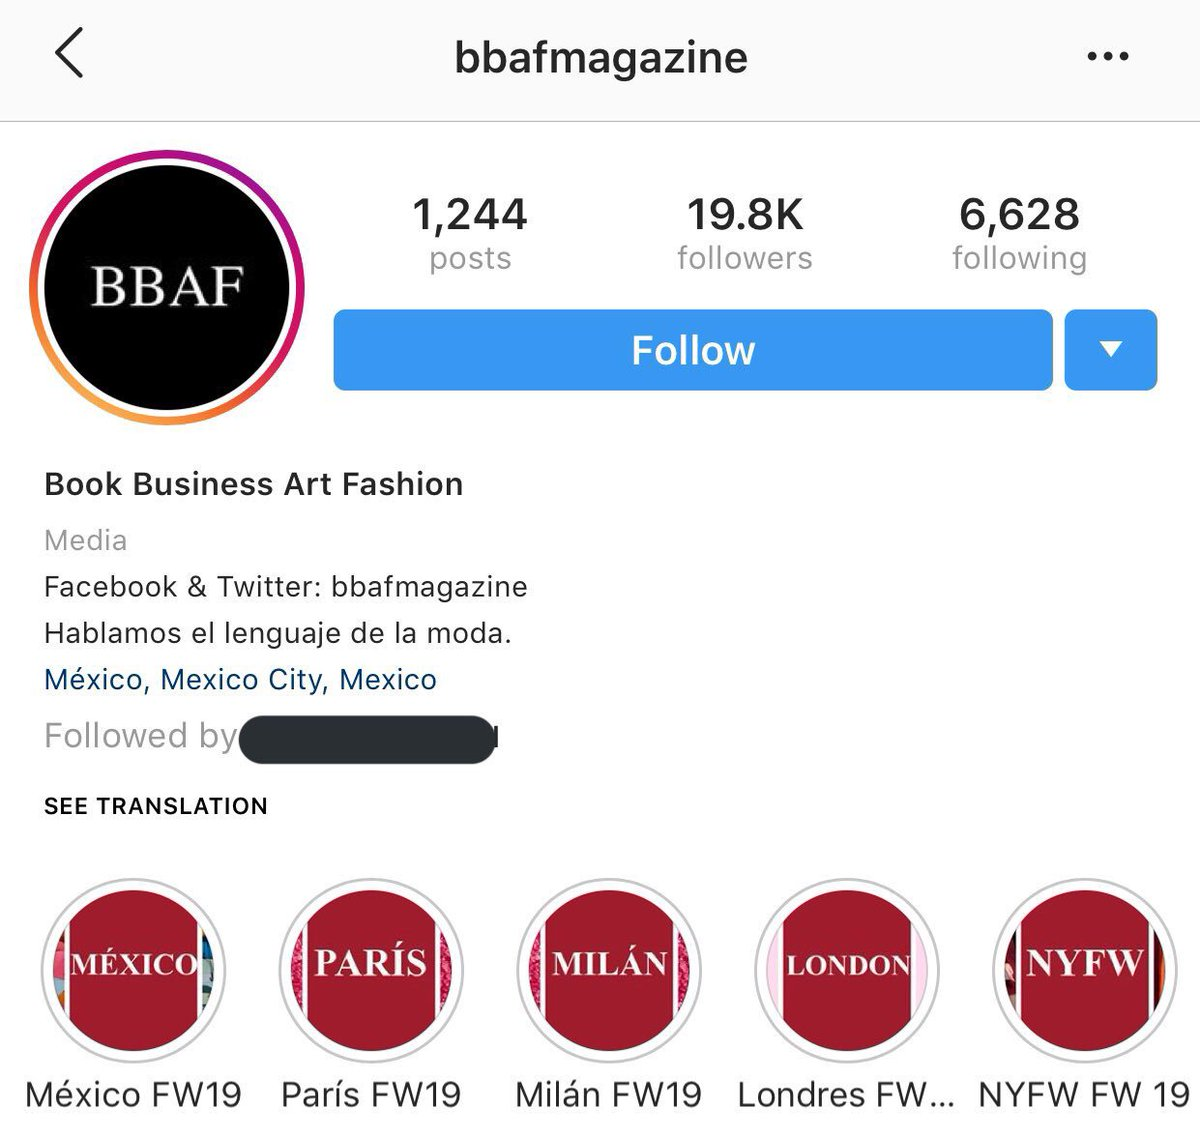 bbafmagazine (Book business Art Fashion Magazine) IG Update!   #GOT7JBwithYSL #JaebeomxYSL #JBxYSL #GOT7 #갓세븐 <br>http://pic.twitter.com/2Qufxq92J1